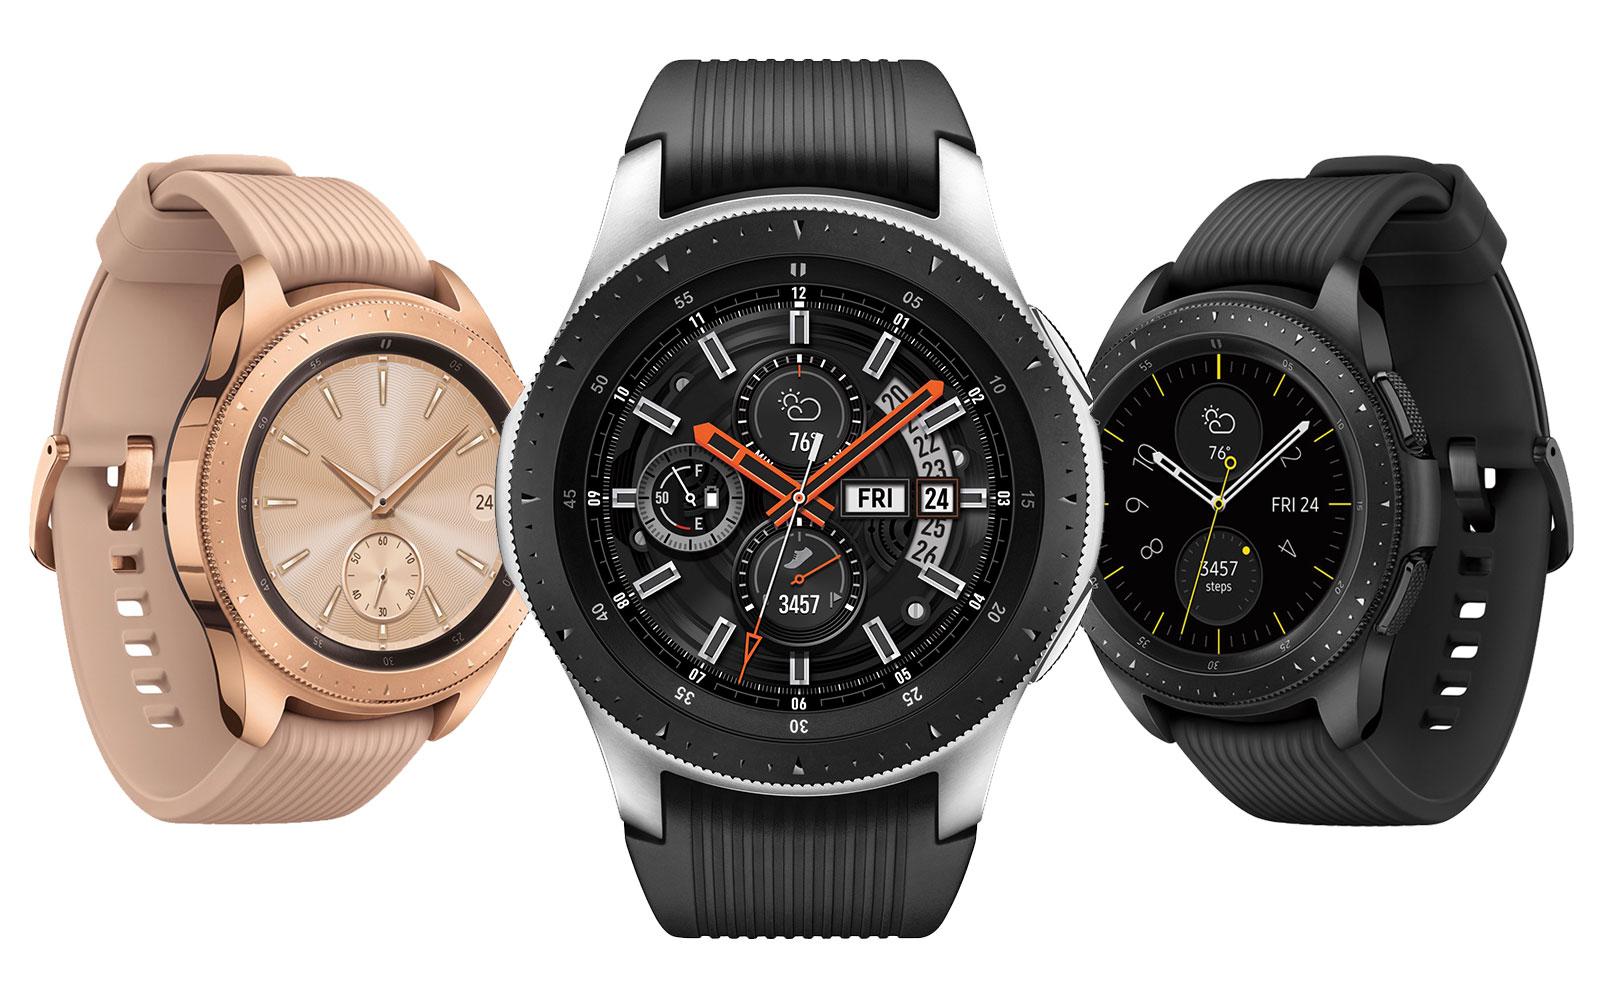 samsung s galaxy watch looks like a real watch